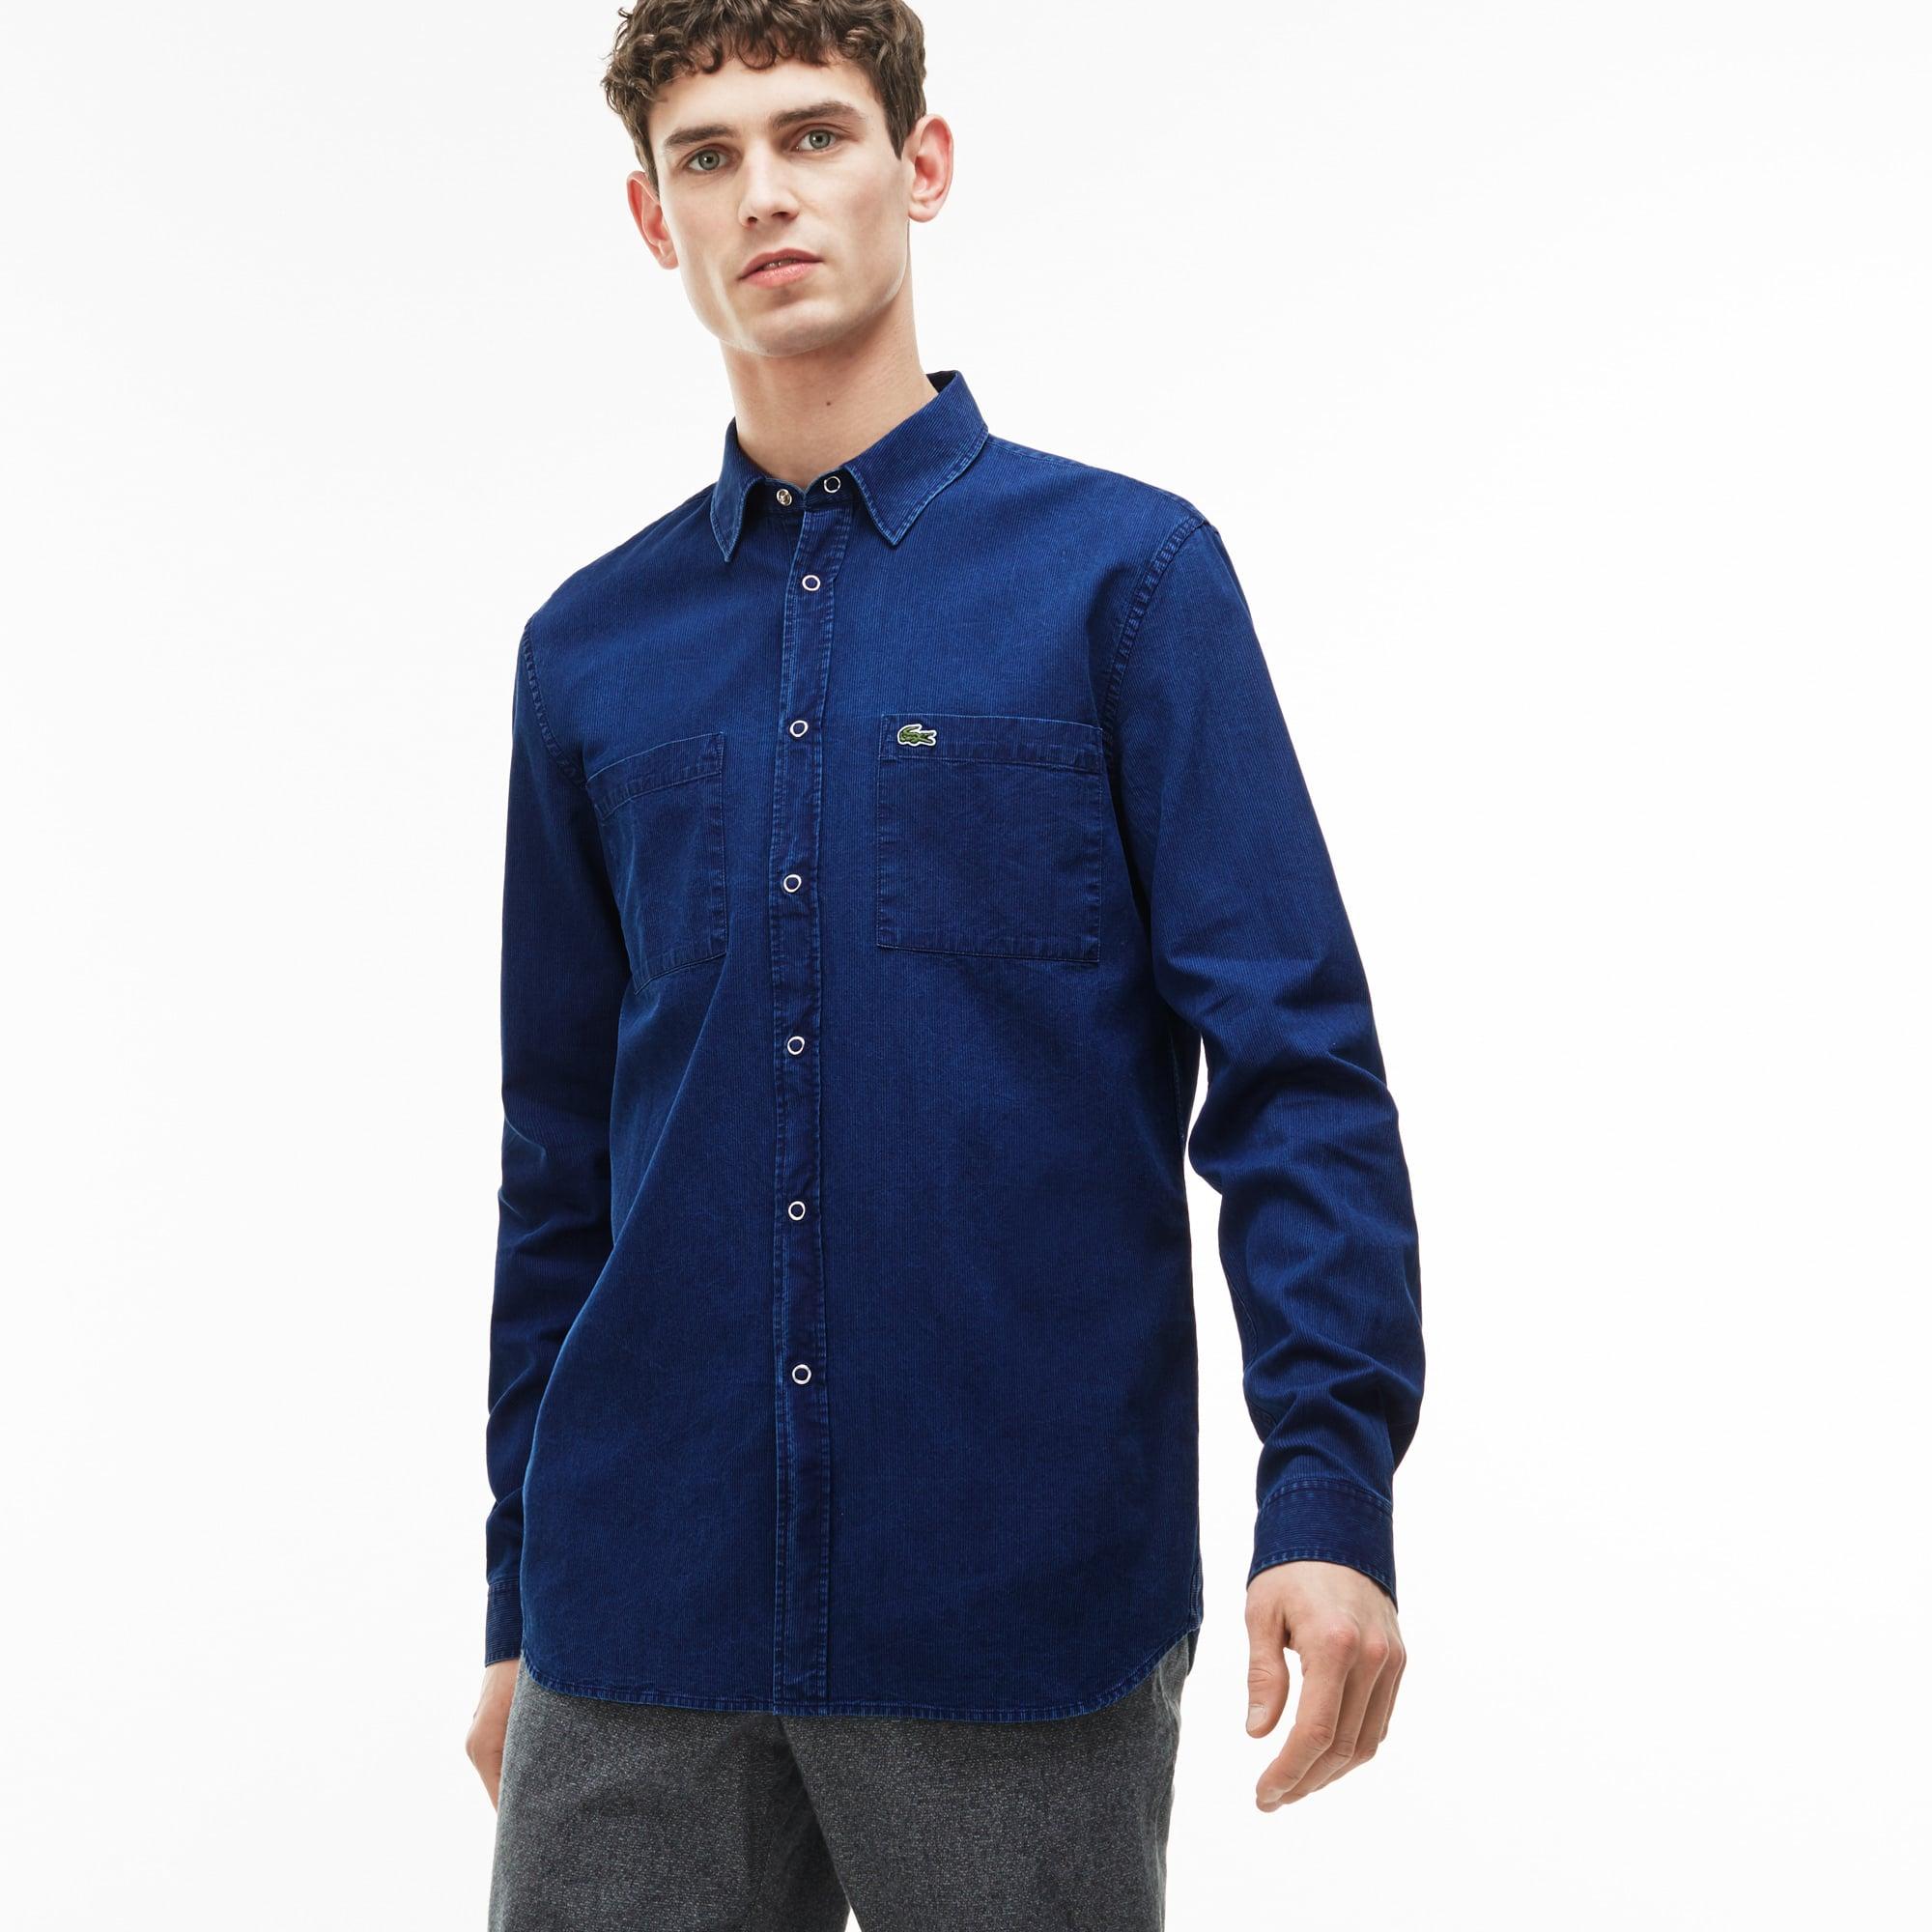 Men's Regular Fit Denim Shirt With Pockets